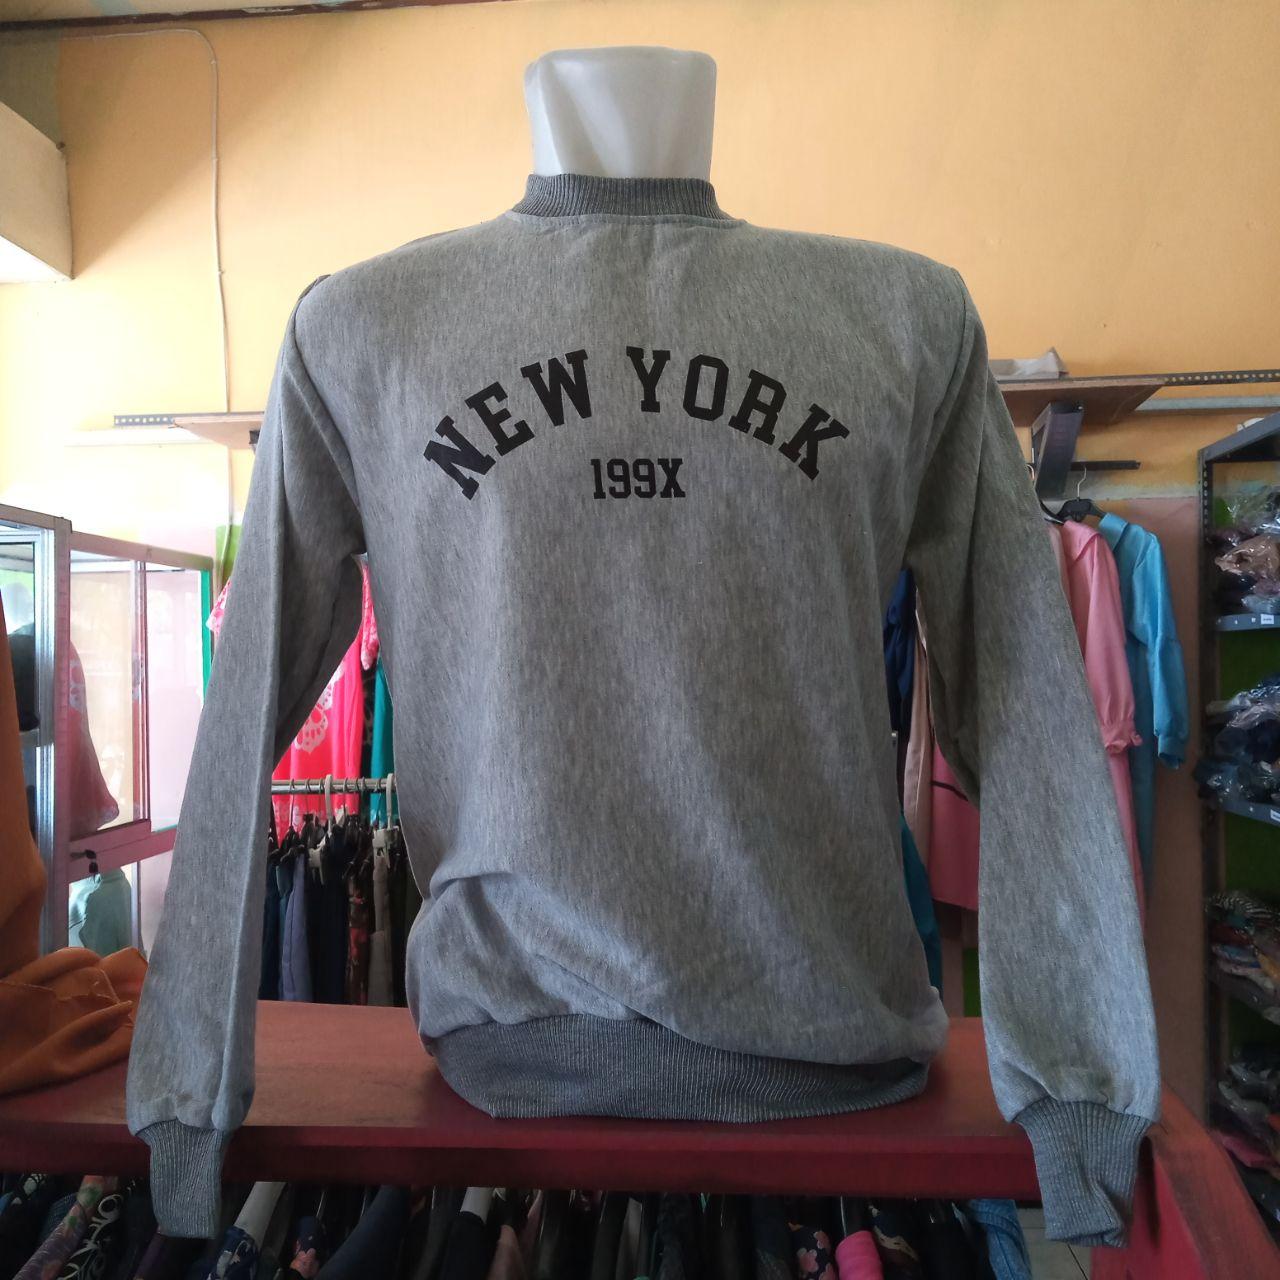 ini adalah Sweater New Abu, size: LD 90cm, Panjang 60cm, material: Fleece, color: Grey, brand: jaketindonesia, age_group: all ages, gender: unisex